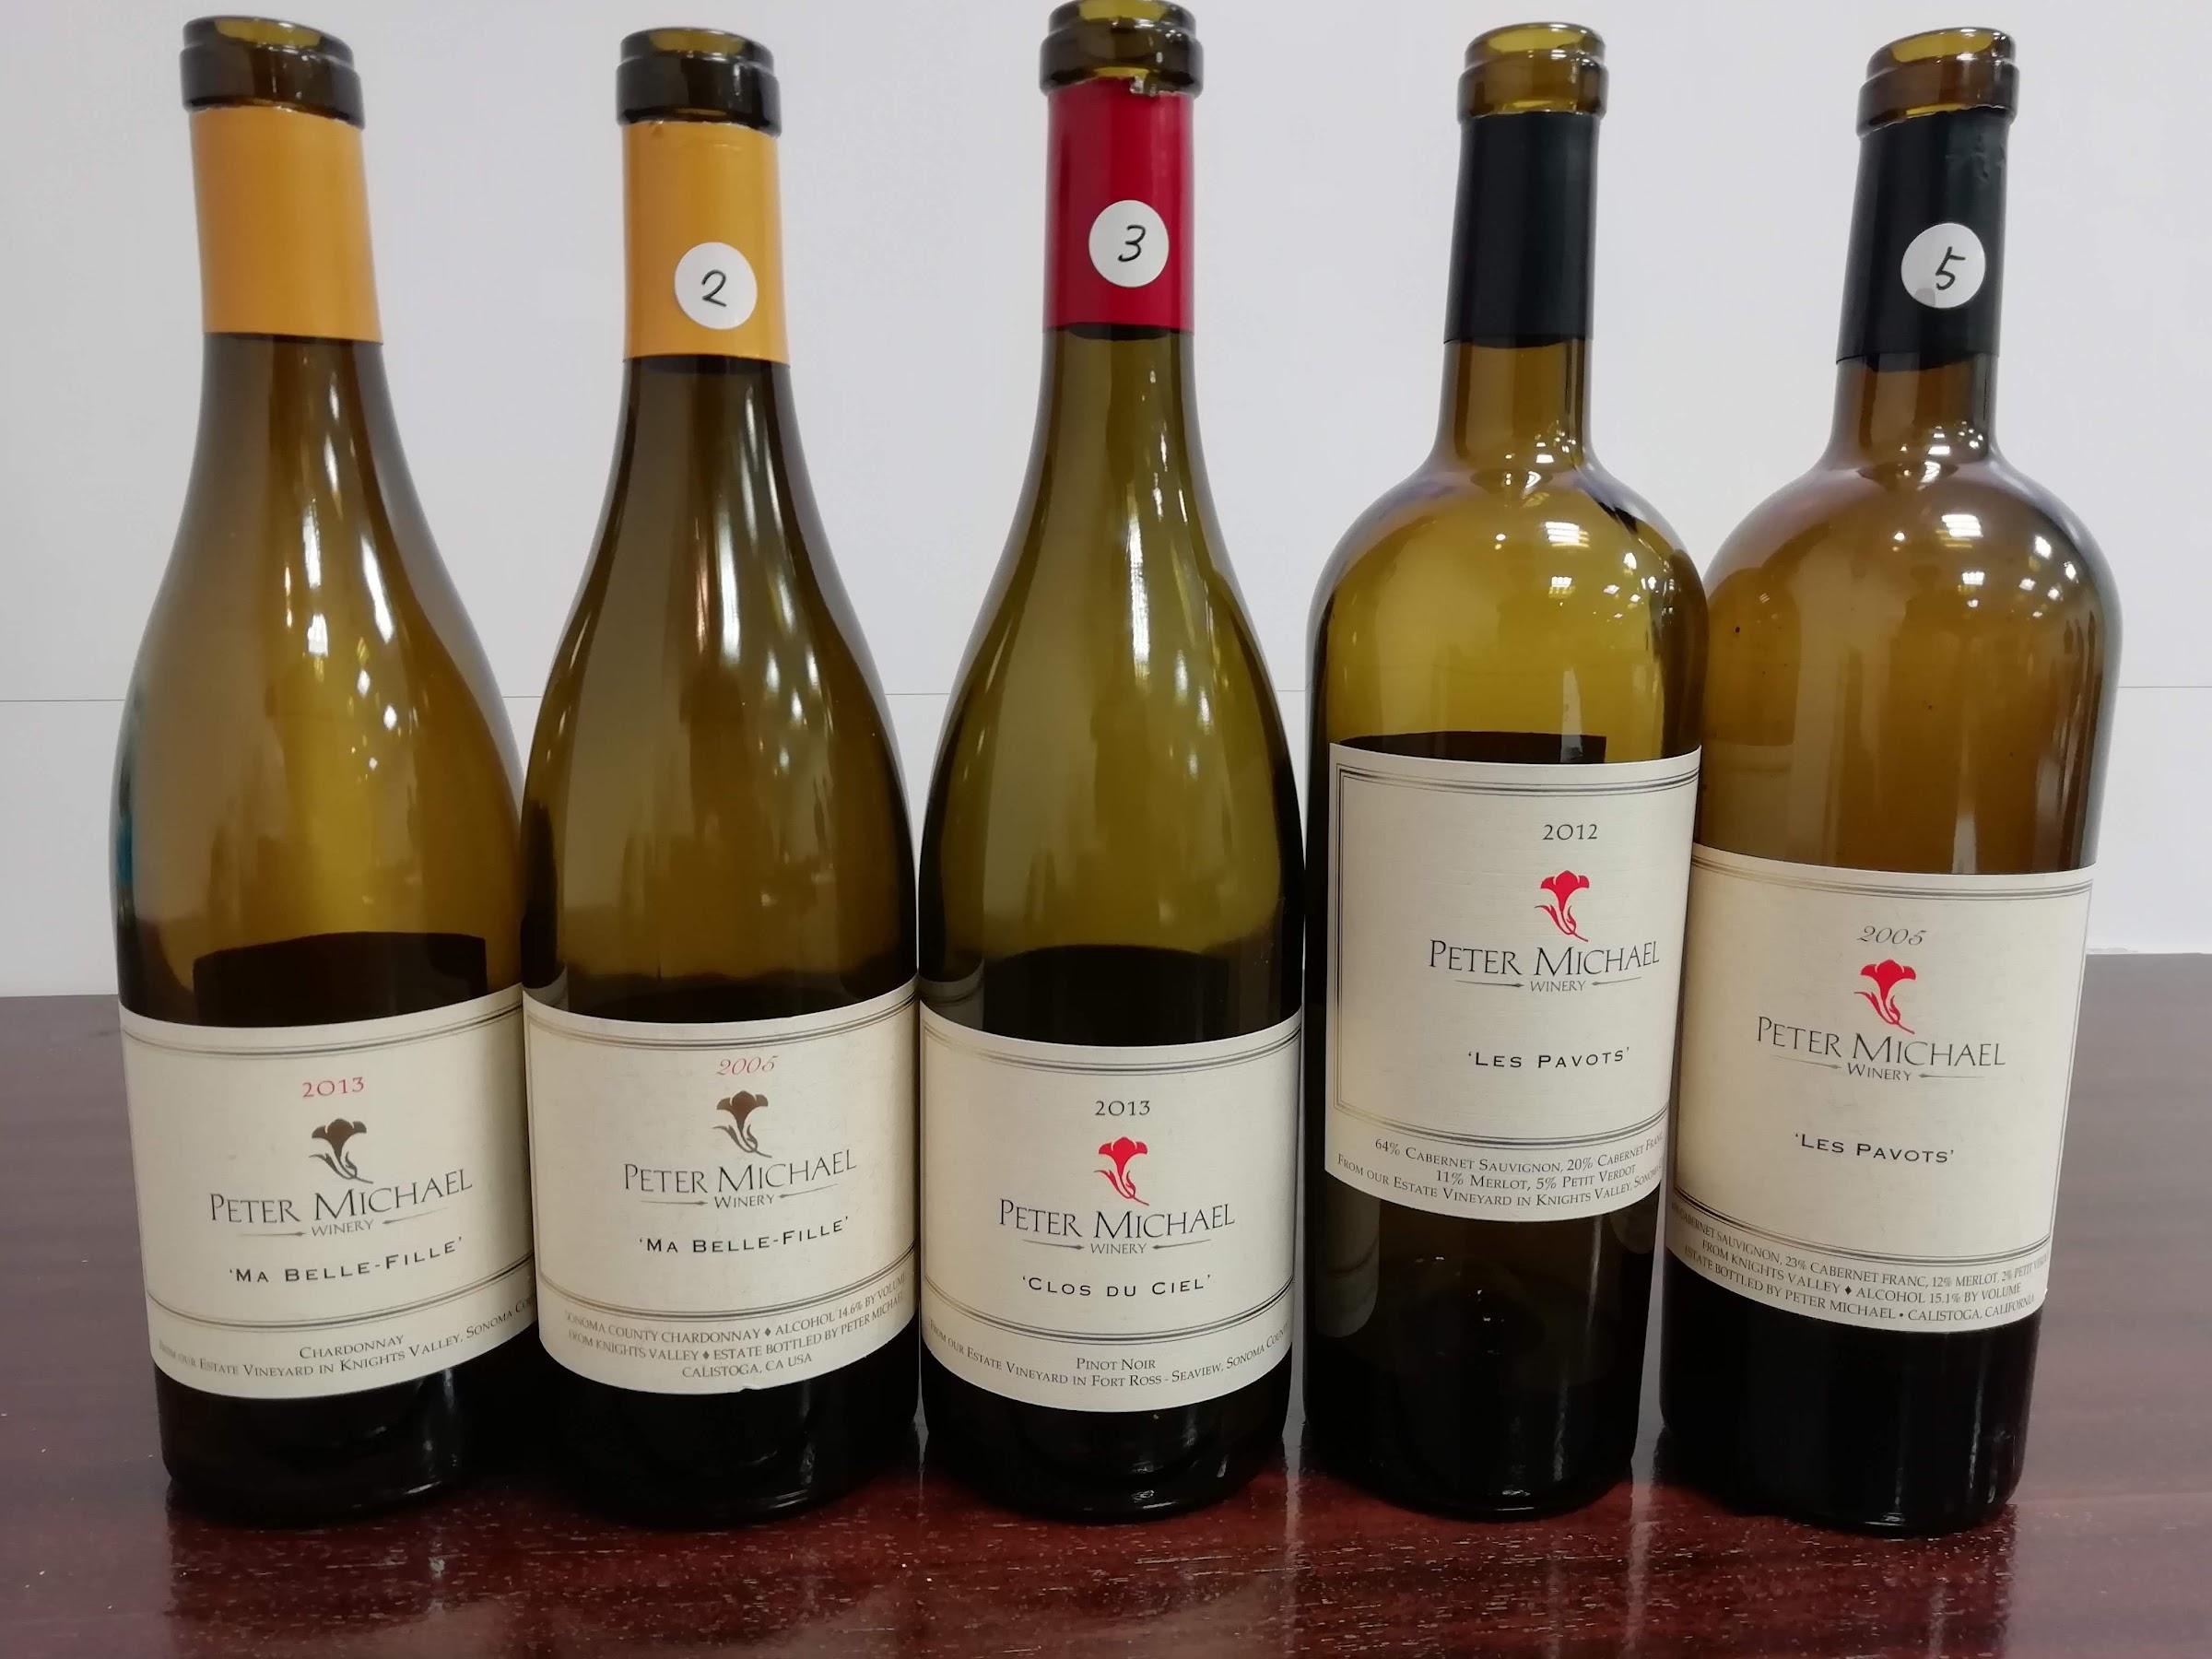 4a6c5dfd514 アカデミー・デュ・ヴァンの今期が終わりました « カリフォルニアワイン ...